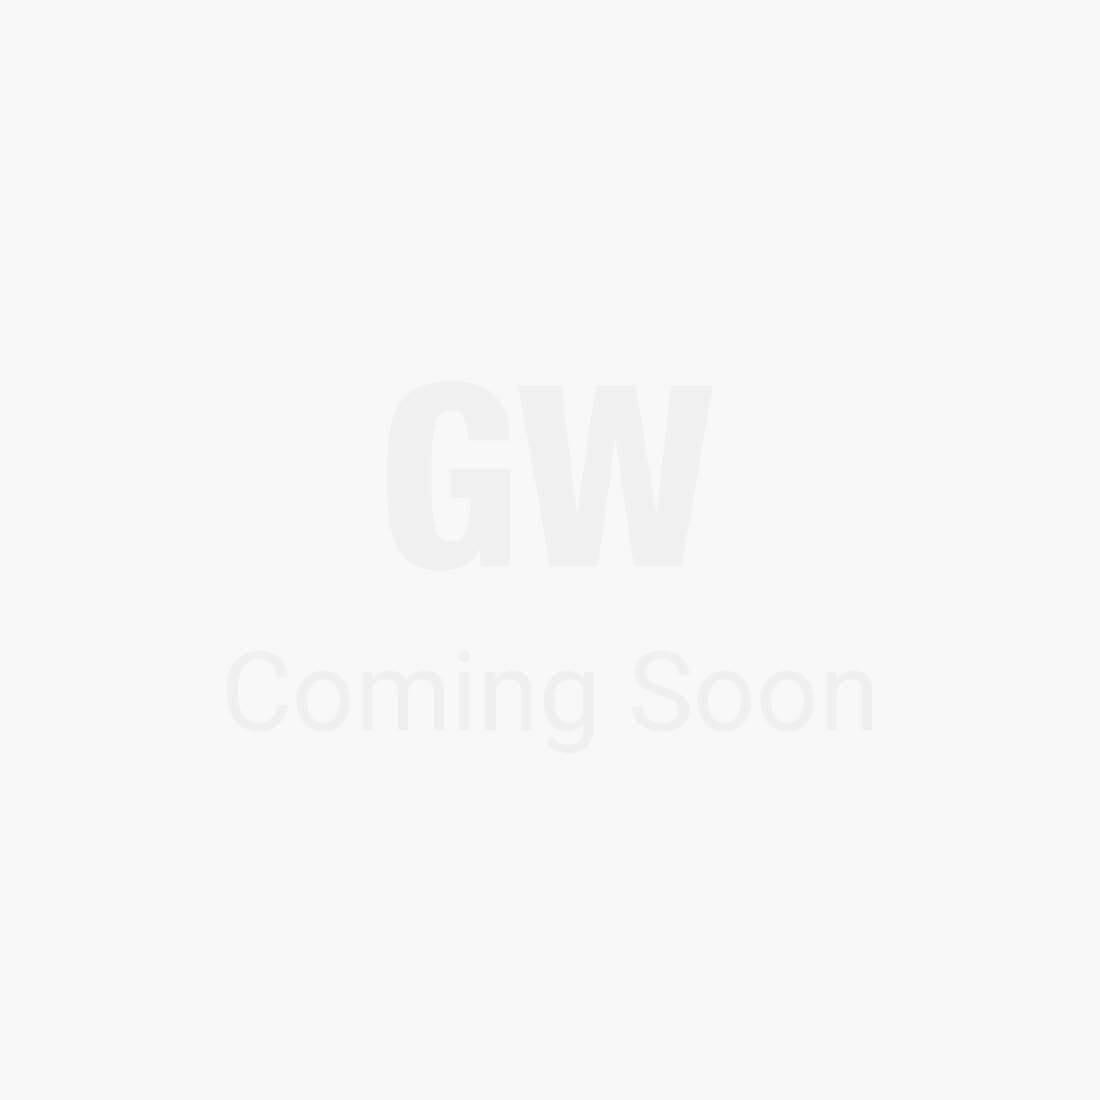 Cabana Link Side Table